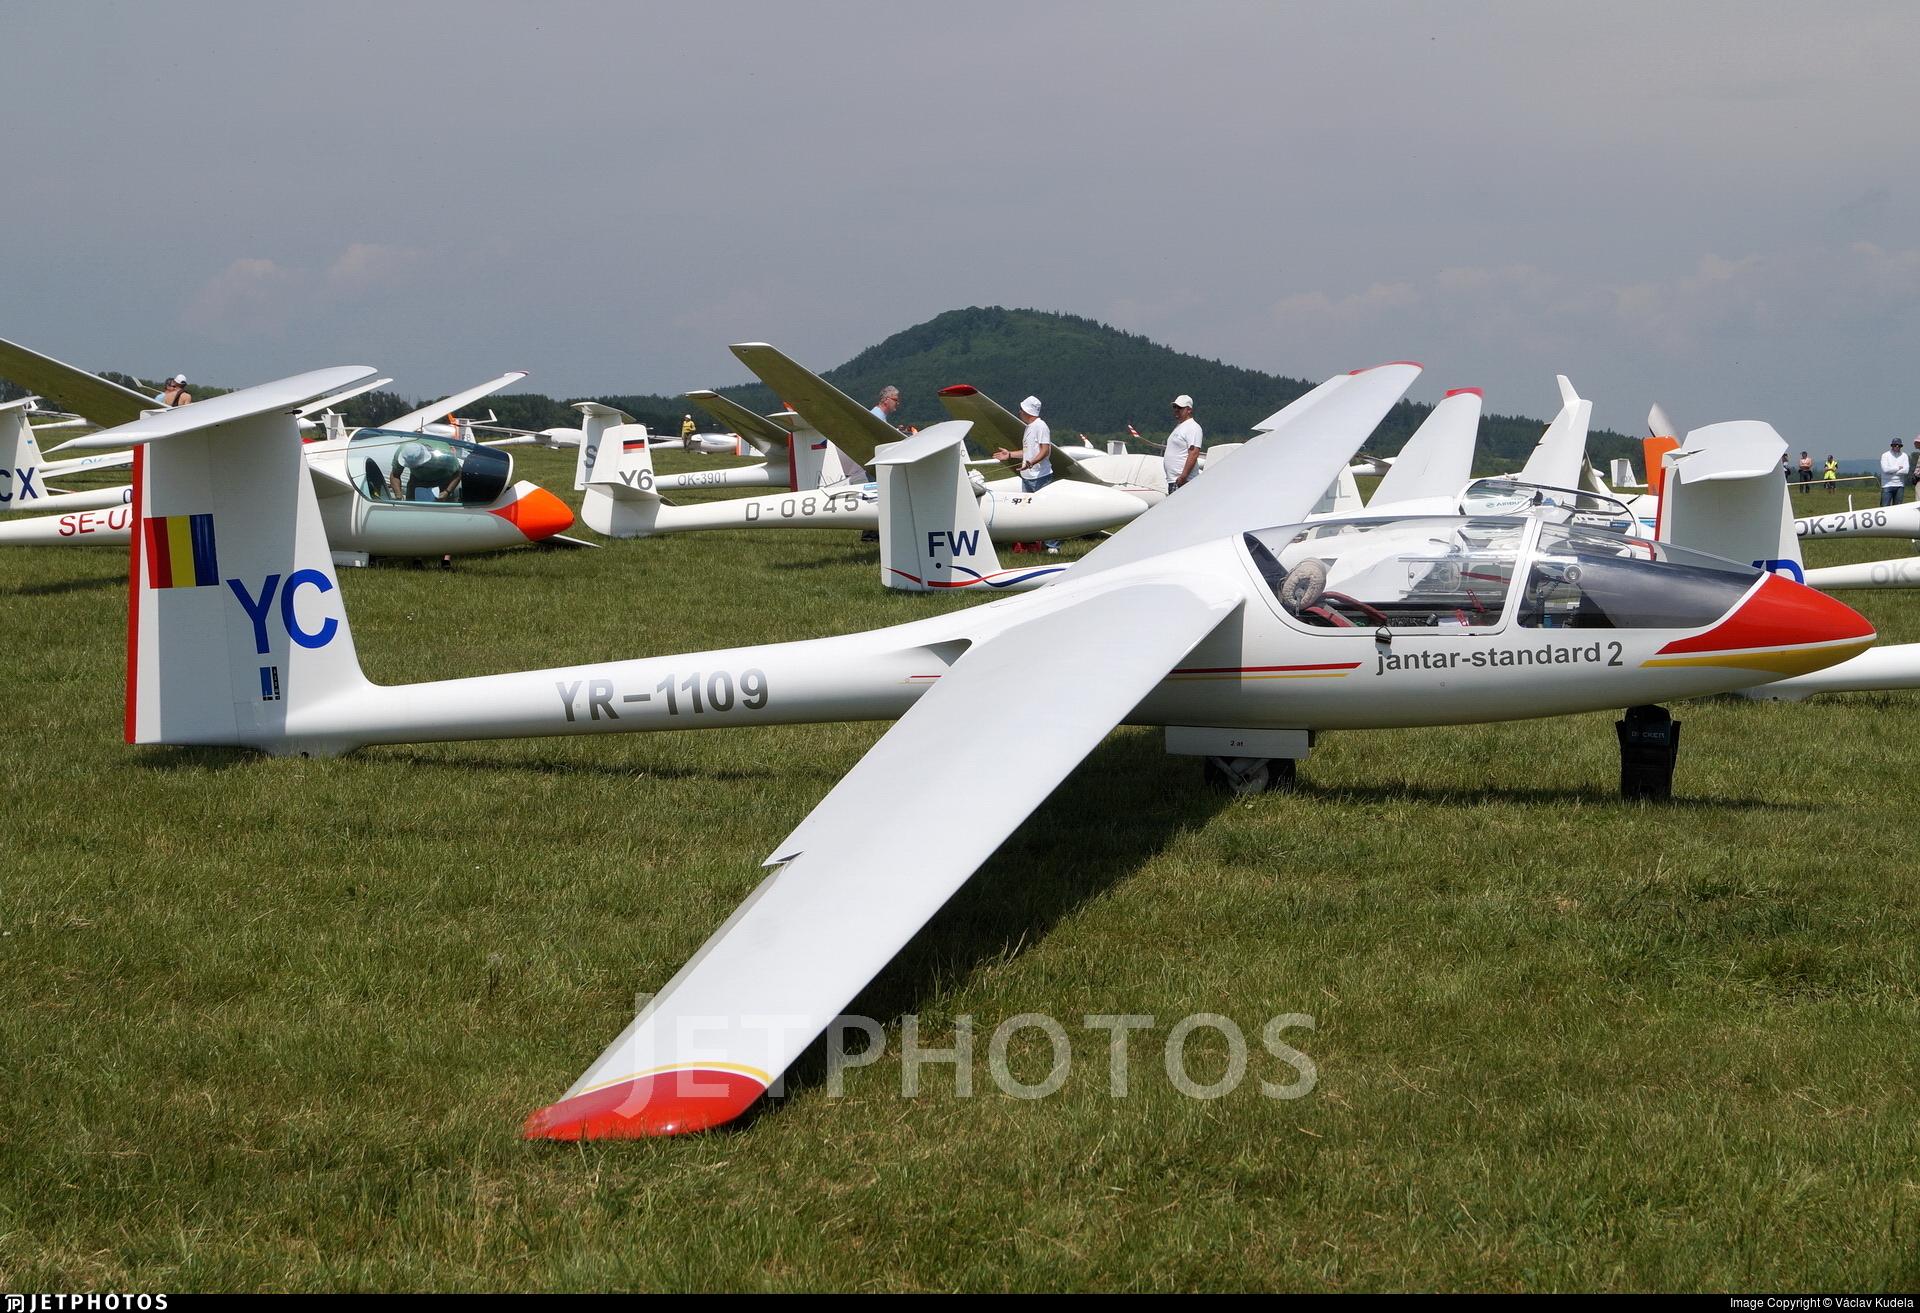 YR-1109 - SZD 48 Jantar Standard 2 - Romanian Airclub